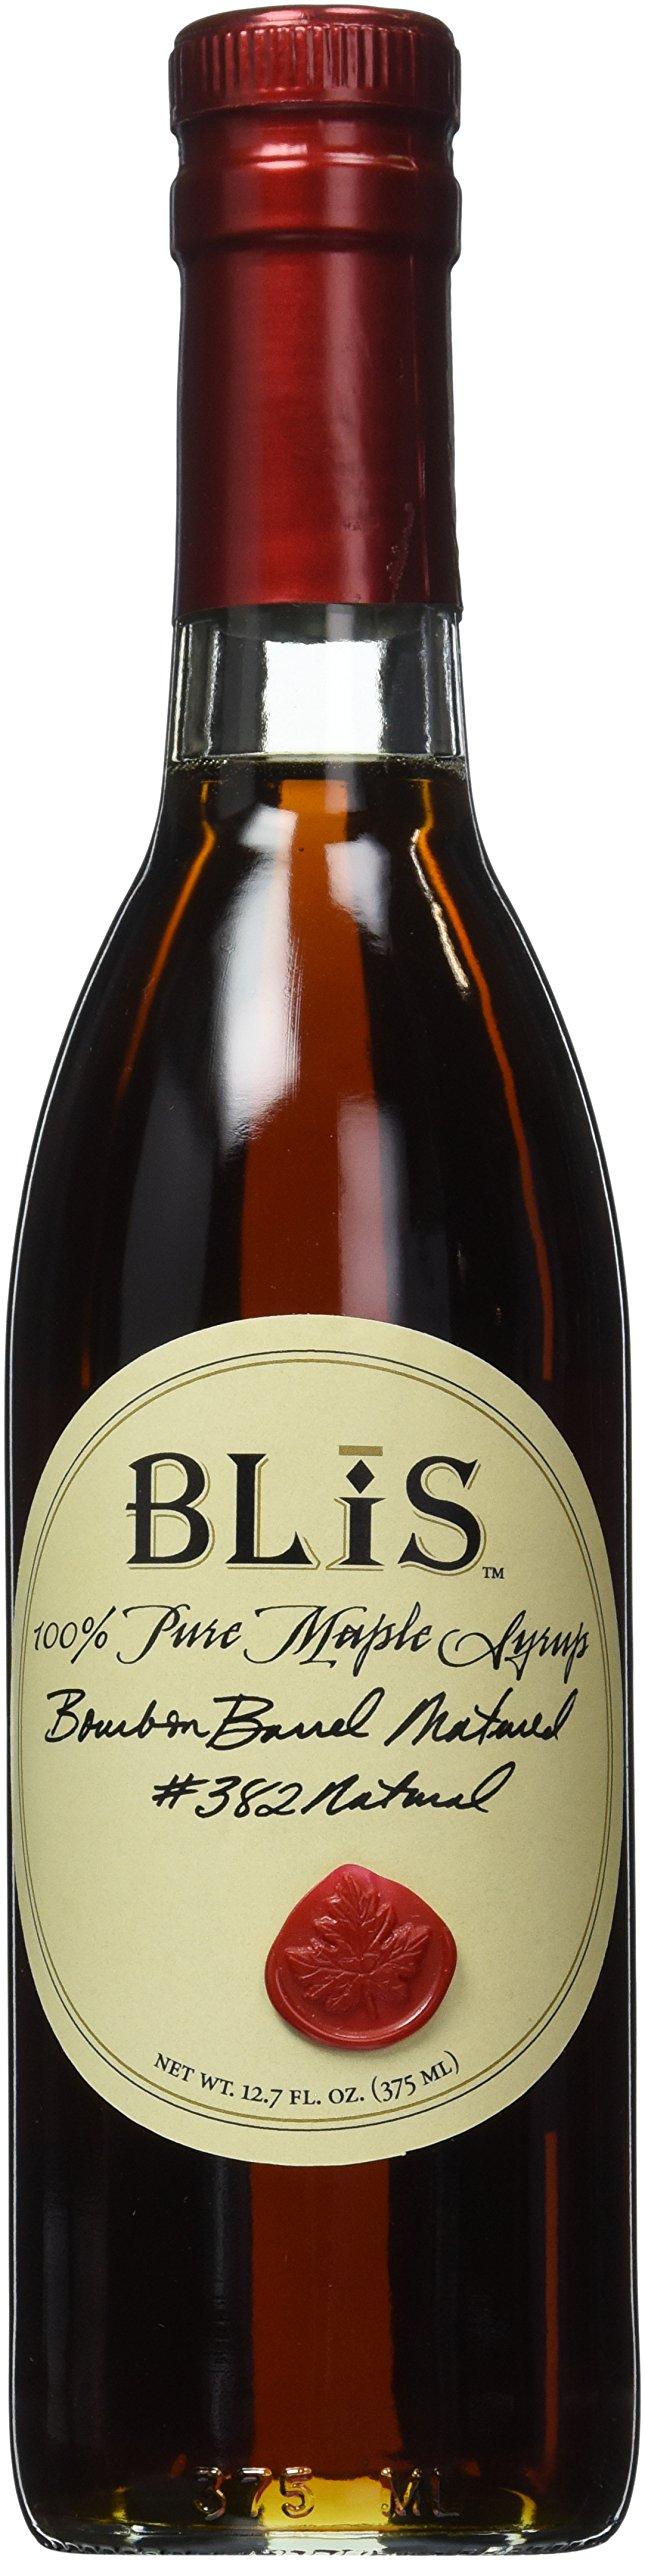 BLiS Bourbon Barrel Matured Pure Maple Syrup, 12.7 Fluid Ounce